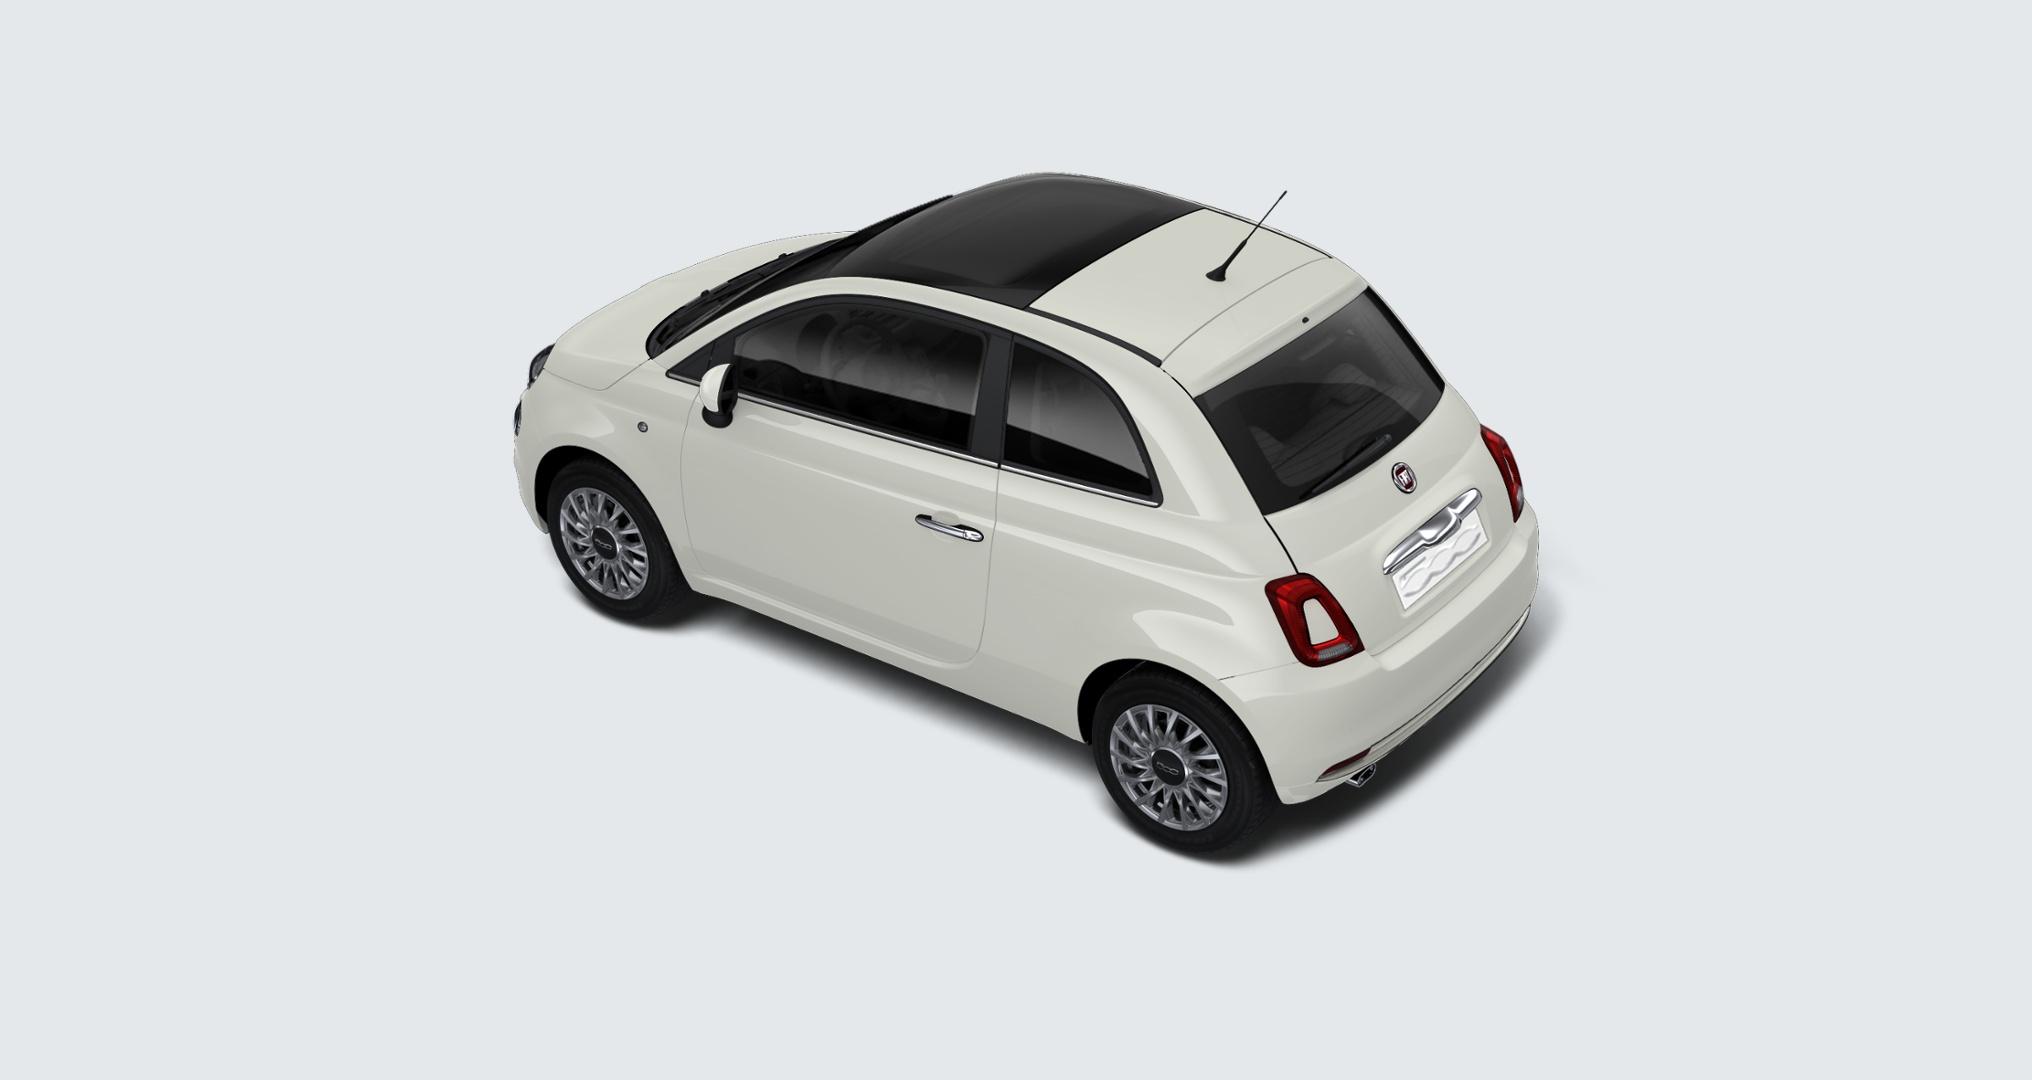 FIAT 500 1.2 Lounge my20 Bianco Gelato Km 0 0000VOX-d